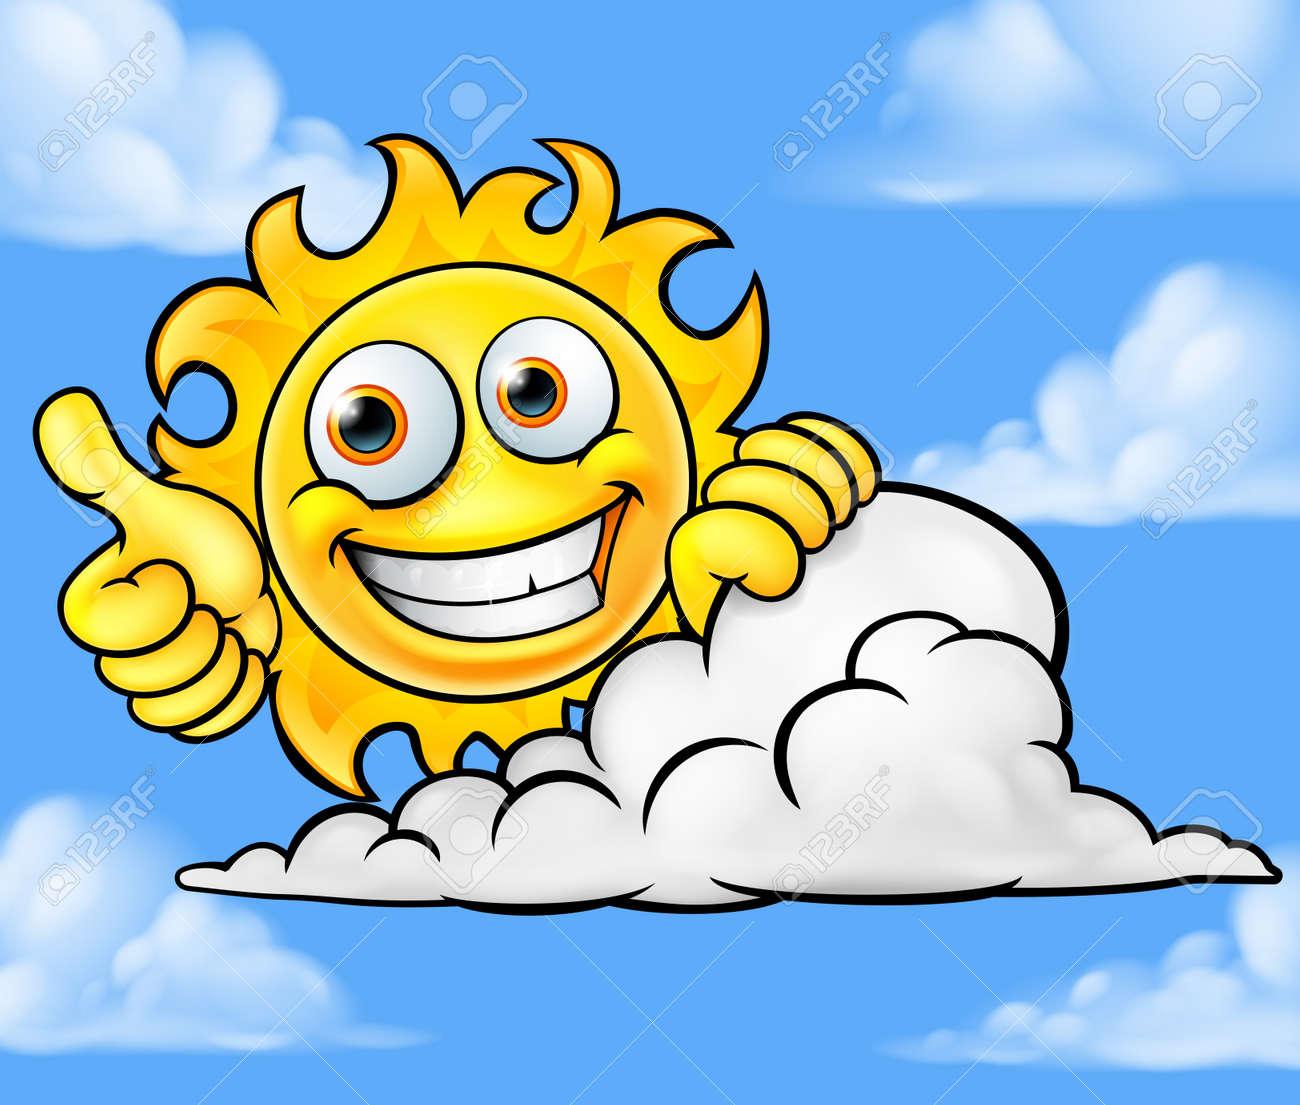 hight resolution of sun cartoon mascot cloud background stock vector 88890764